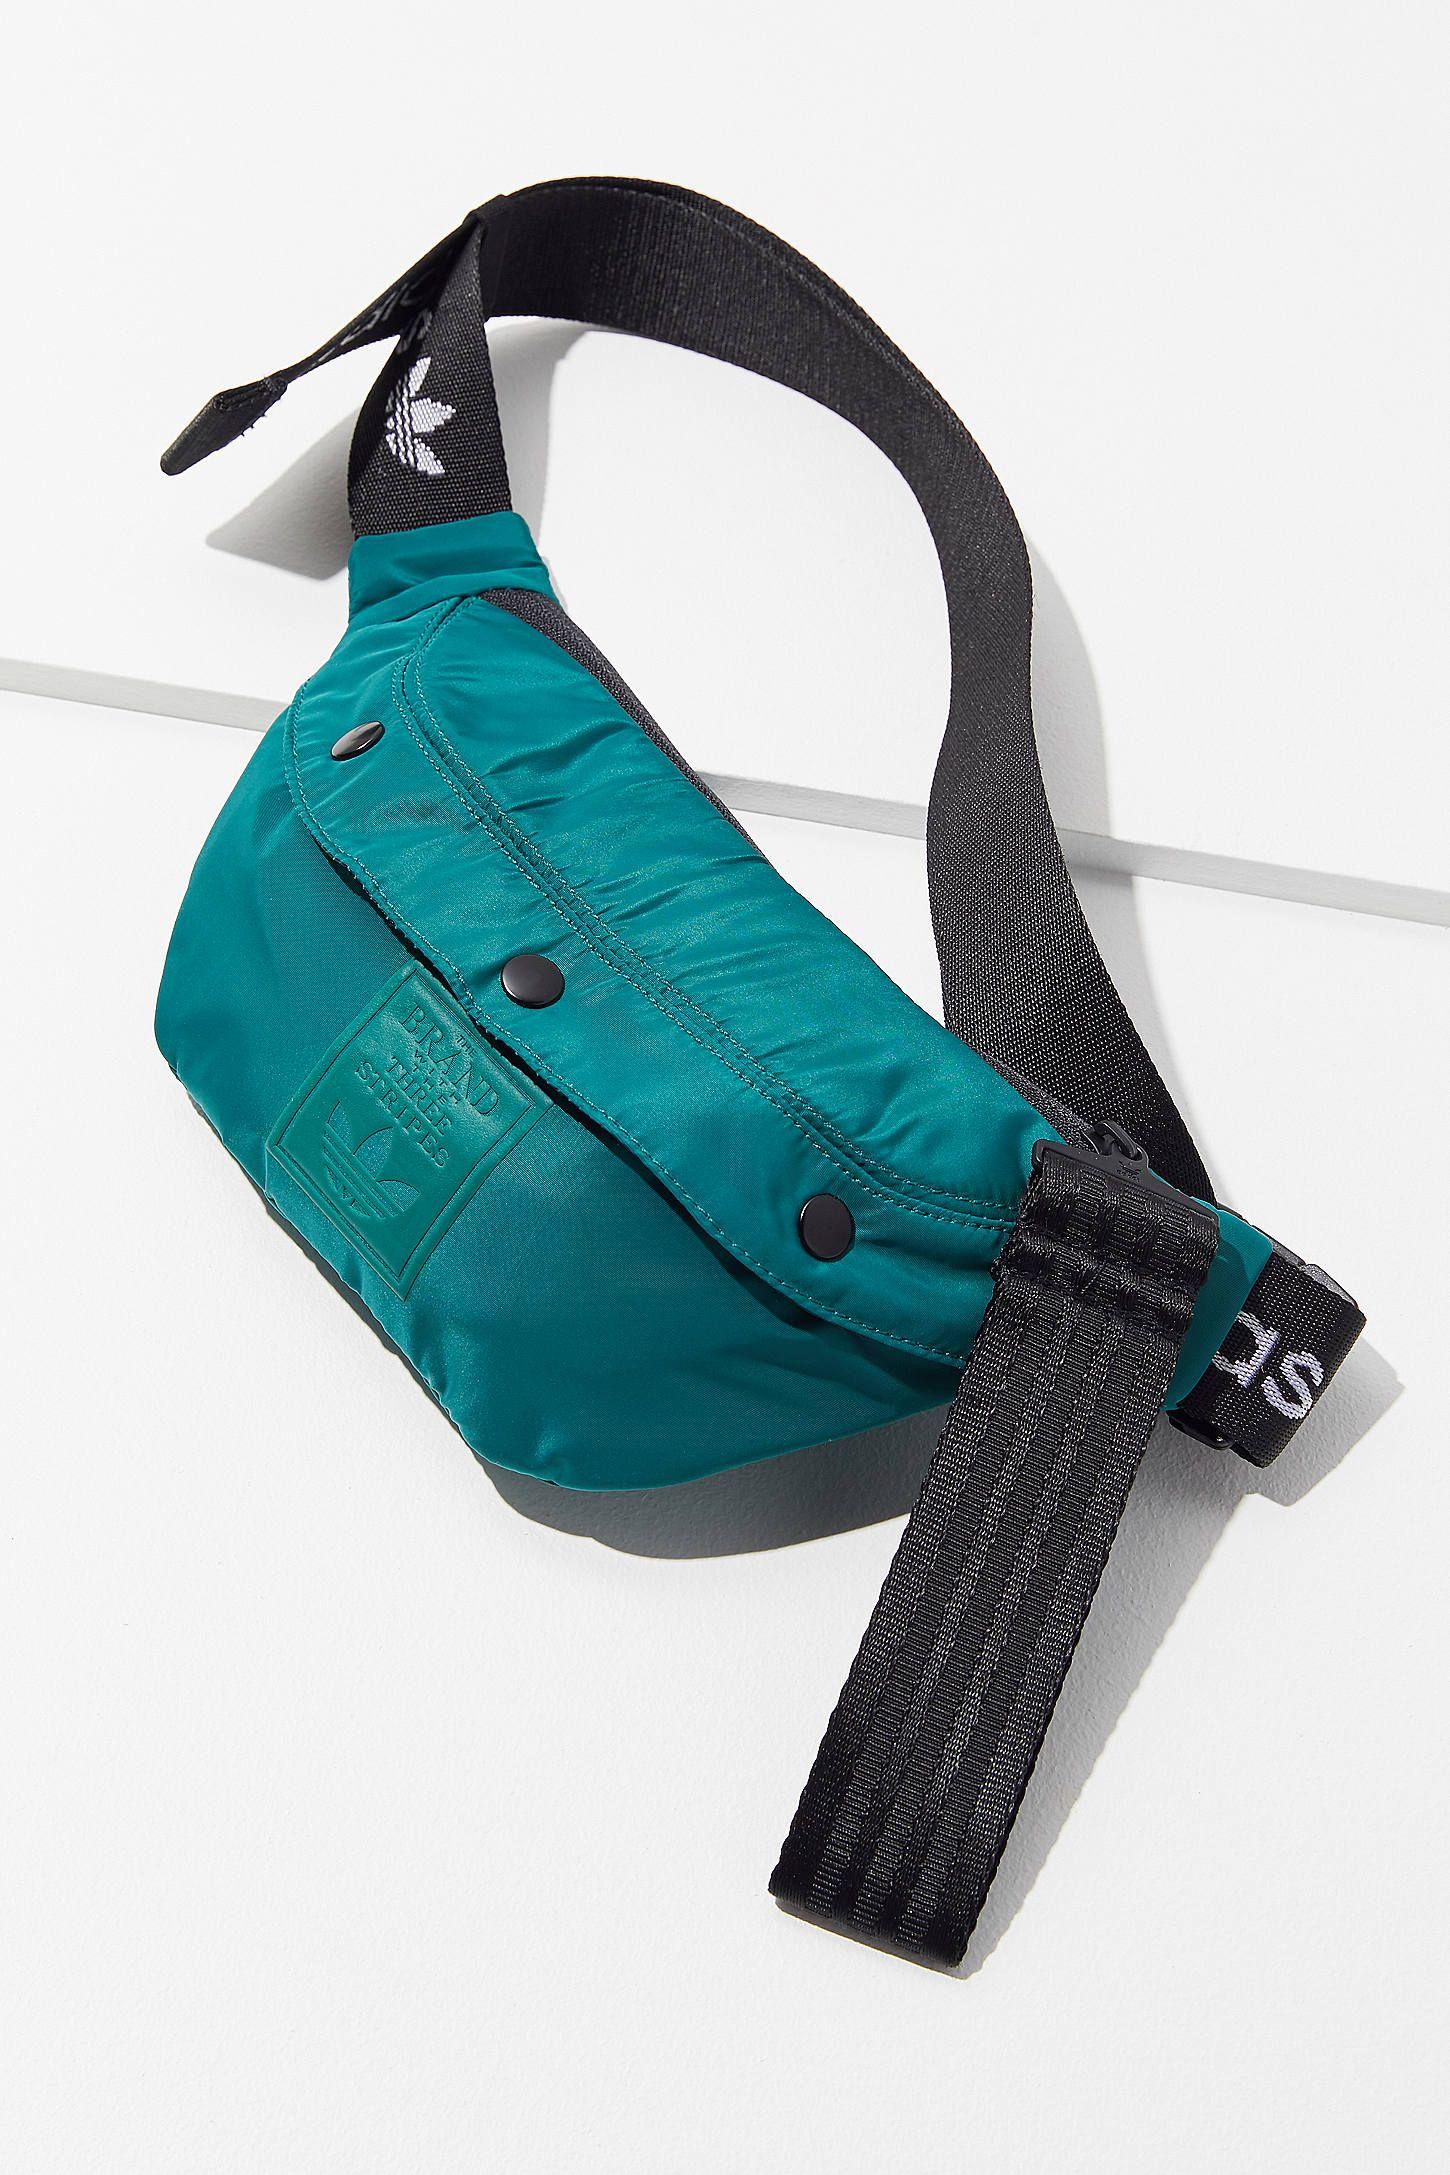 adidas Adibreak Belt Bag   Urban Outfitters   Back packs (Herschel ... 4789054ad0